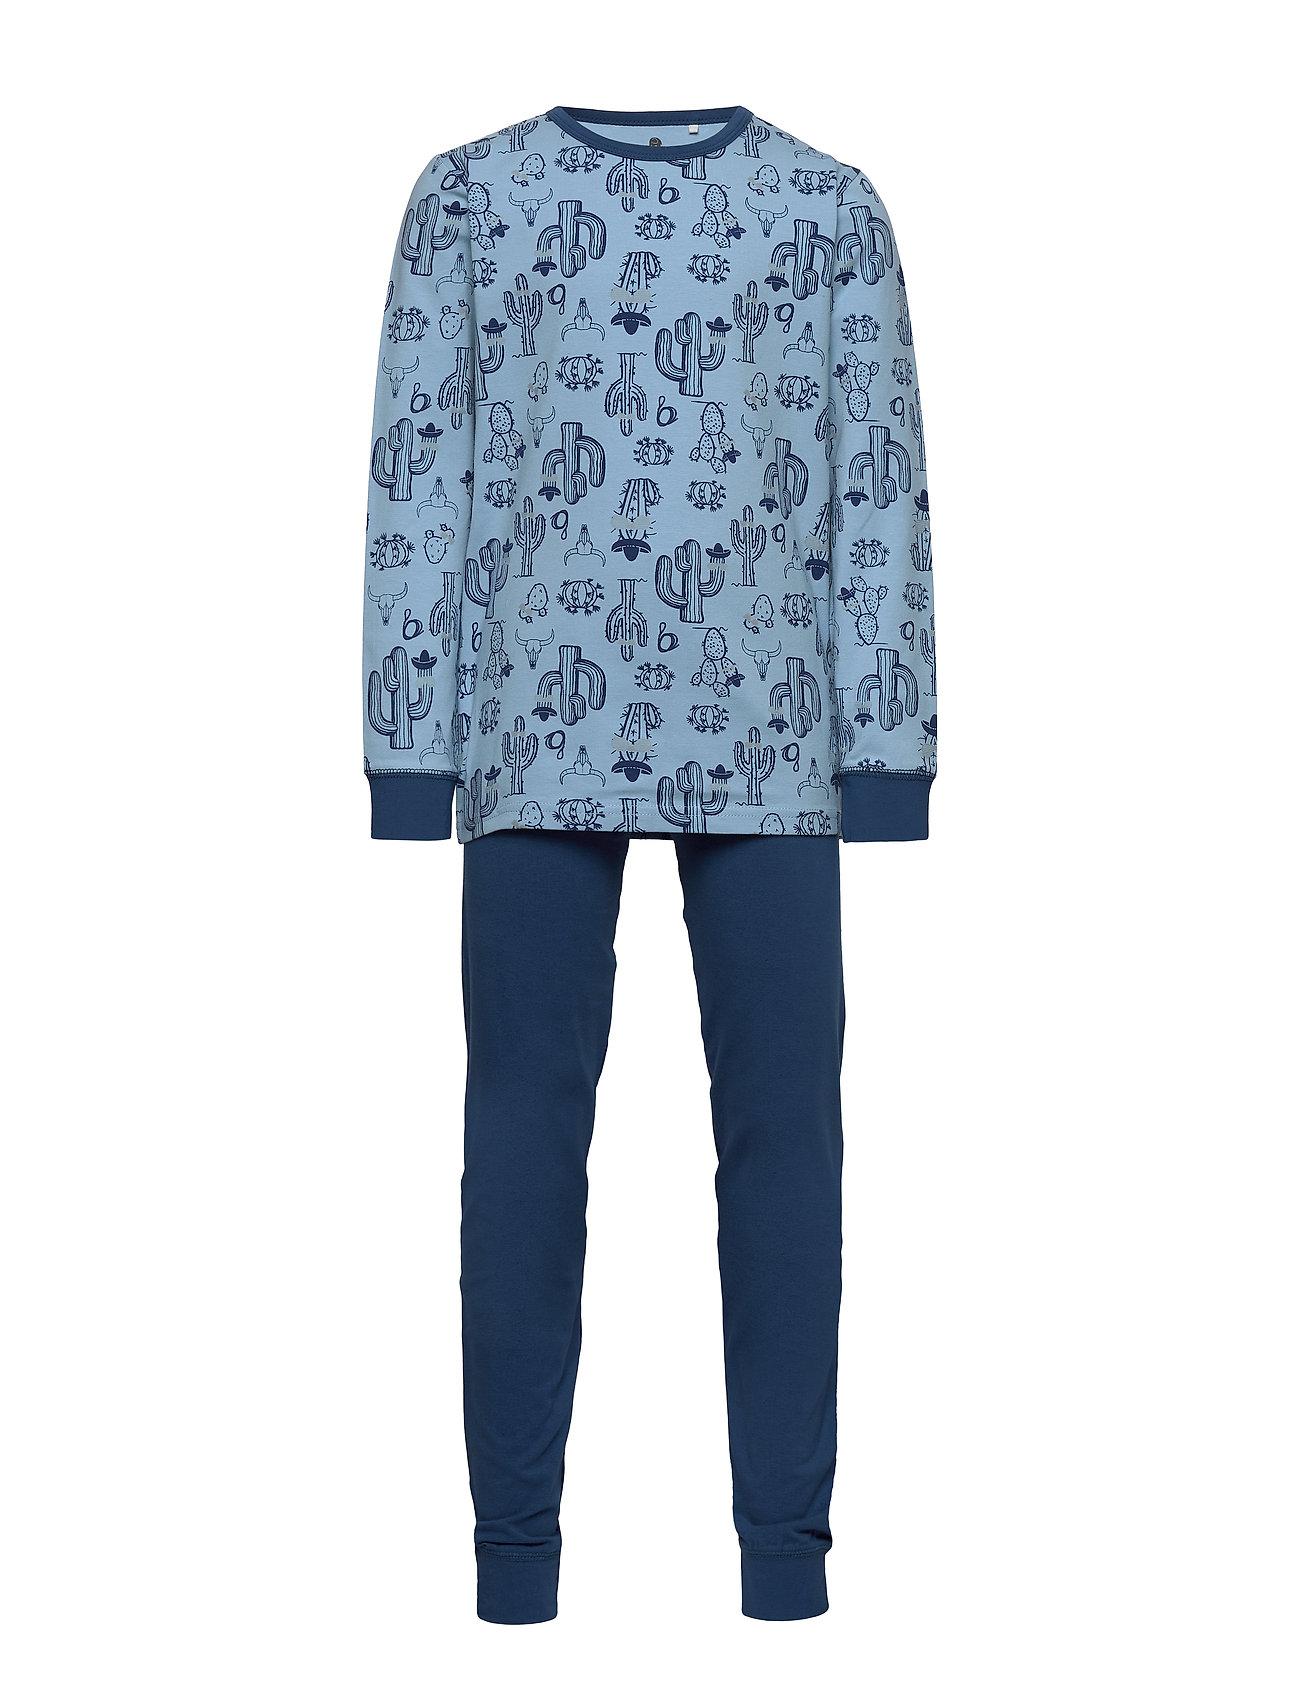 CeLaVi Pajamas w.AOP - DUSK BLUE